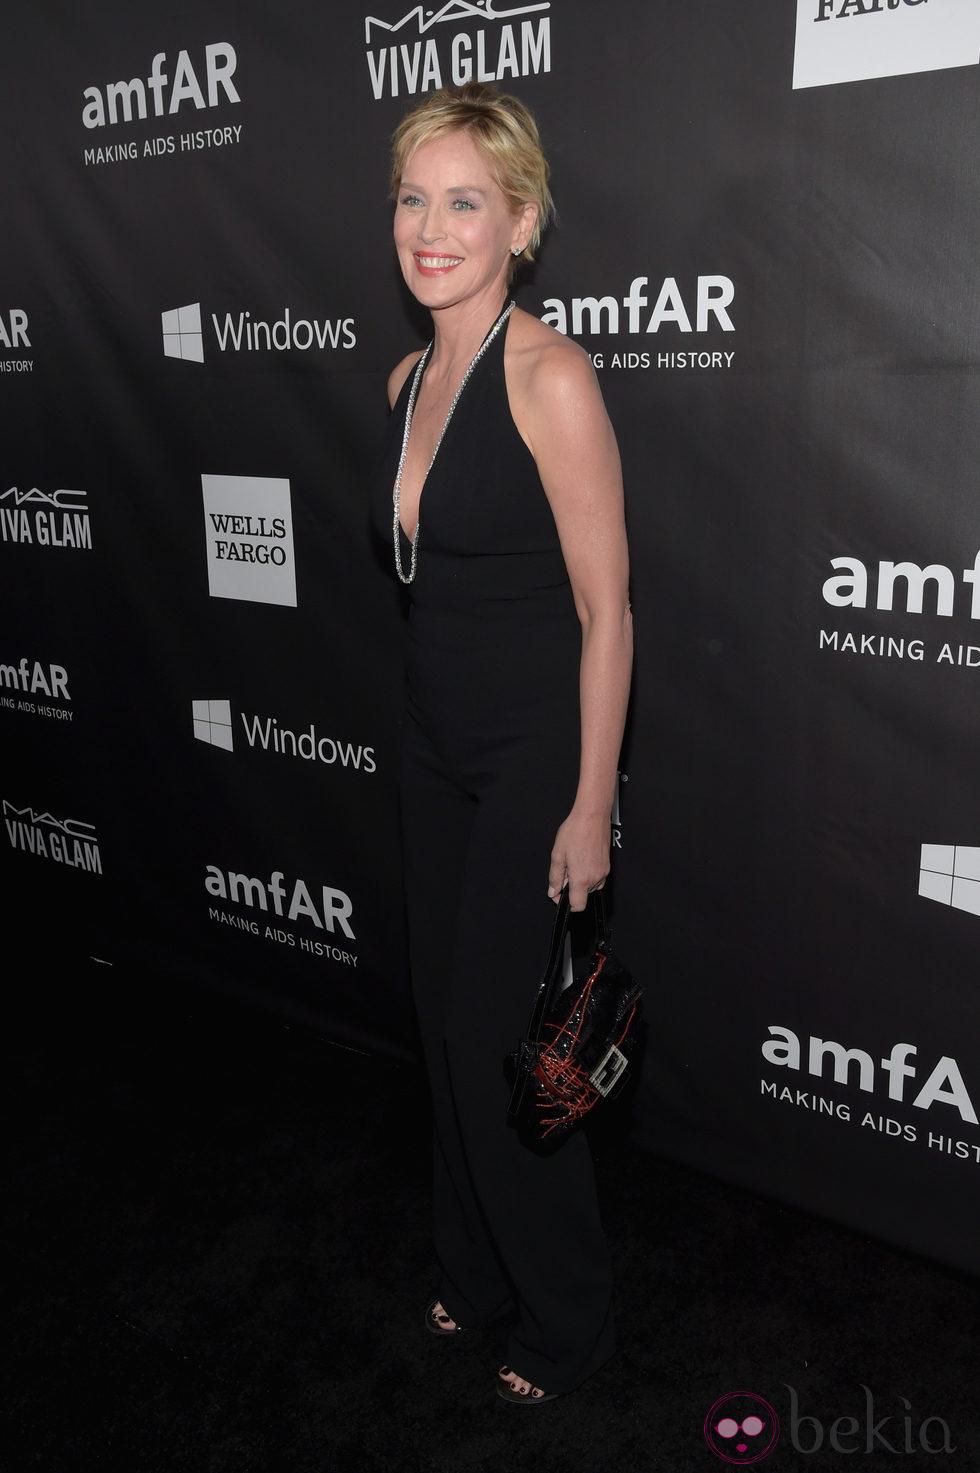 Sharon Stone en la 'AmfAR Inspiration Gala' 2014 en Hollywood